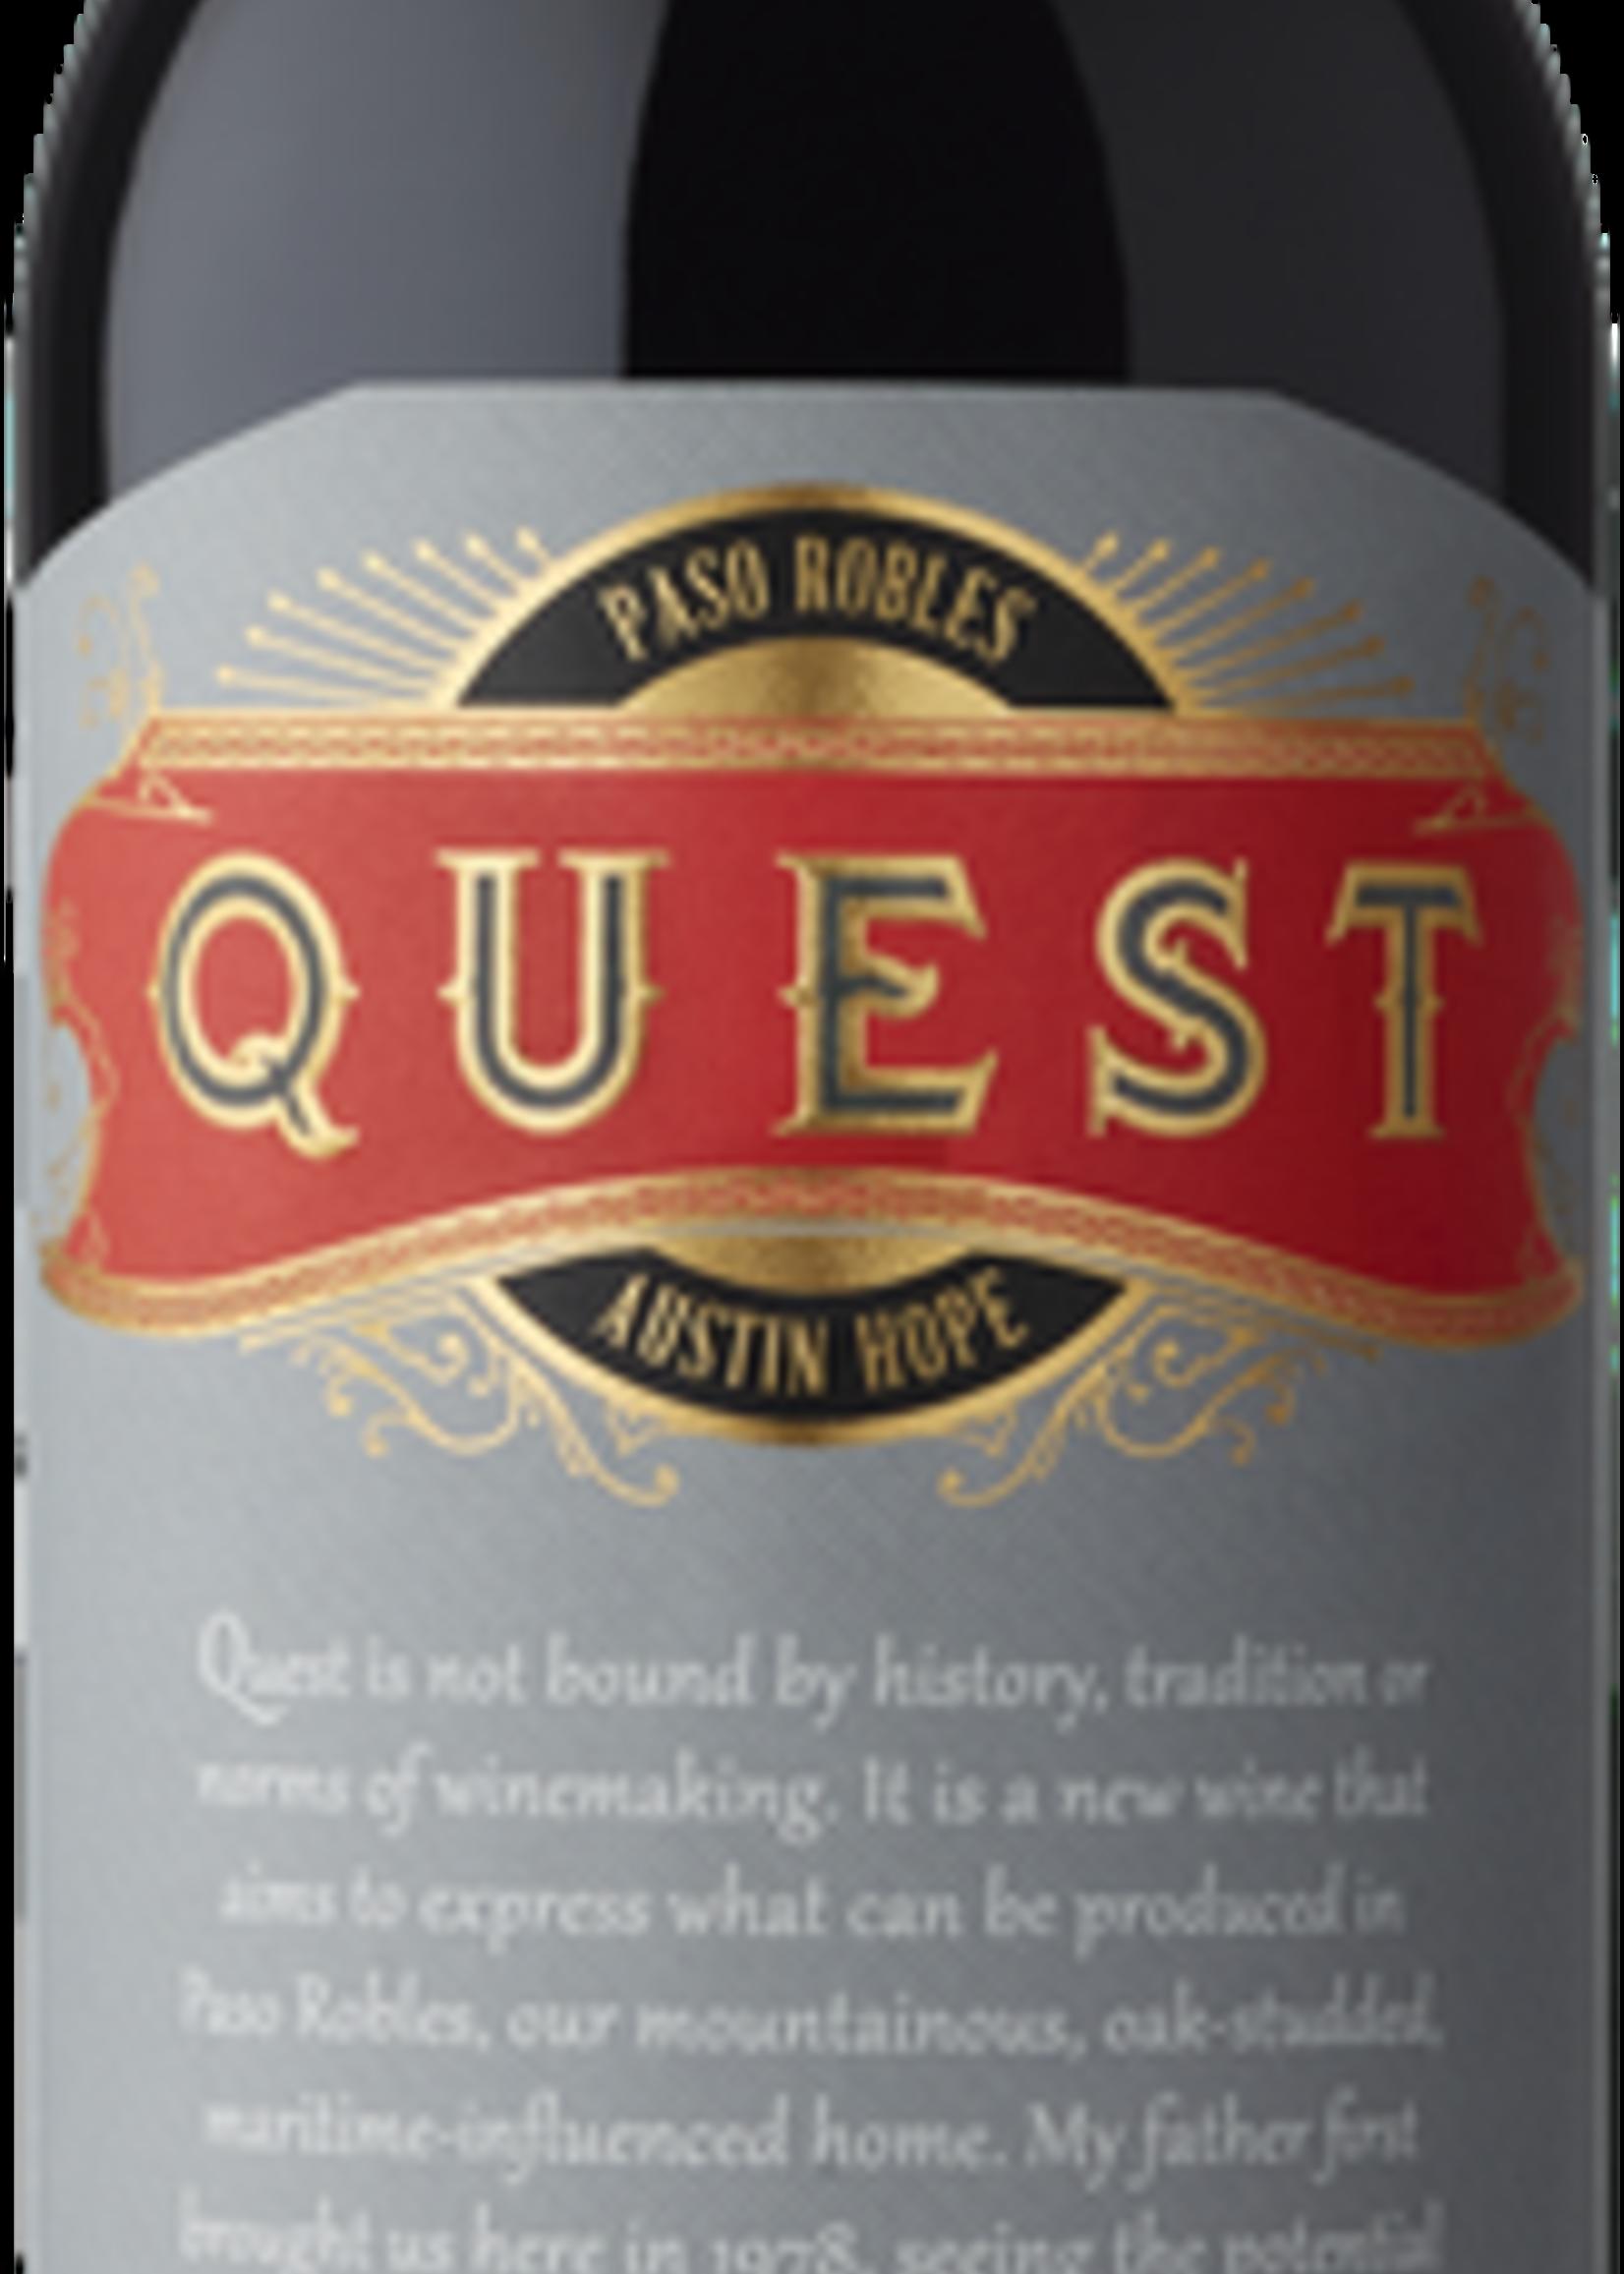 Austin Hope Quest Red Blend